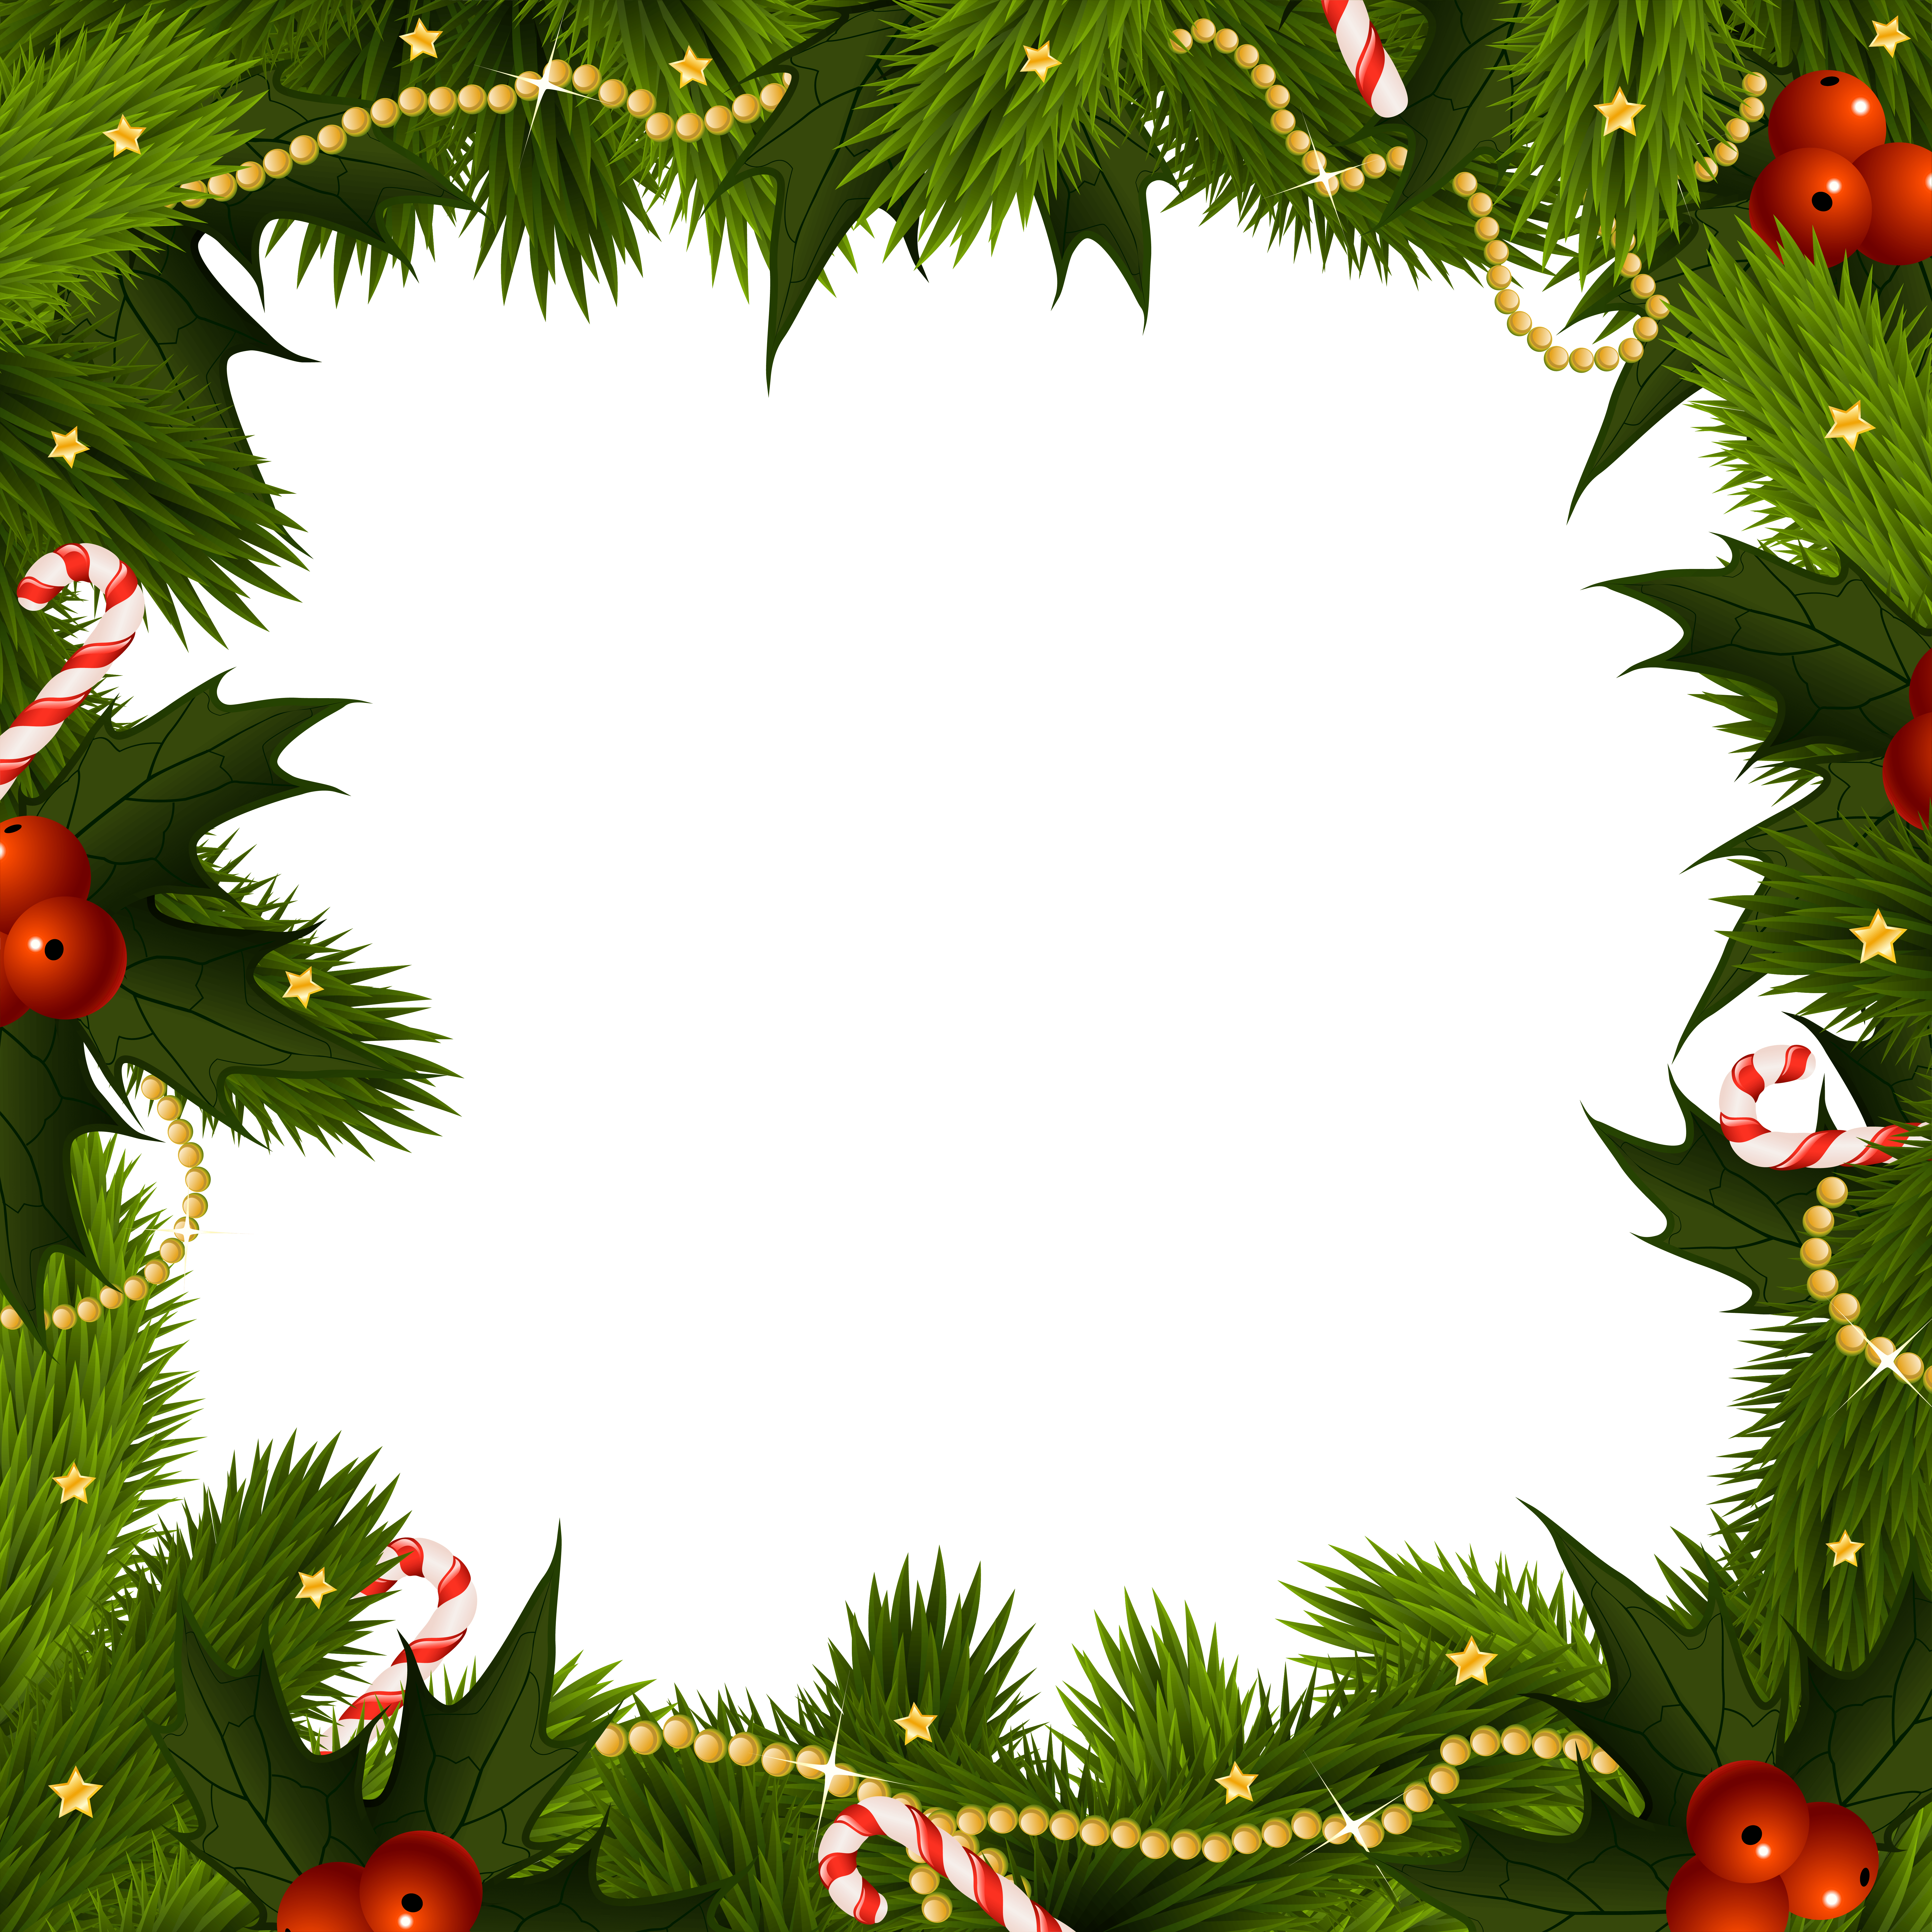 Christmas Border Wallpapers - Wallpaper Cave